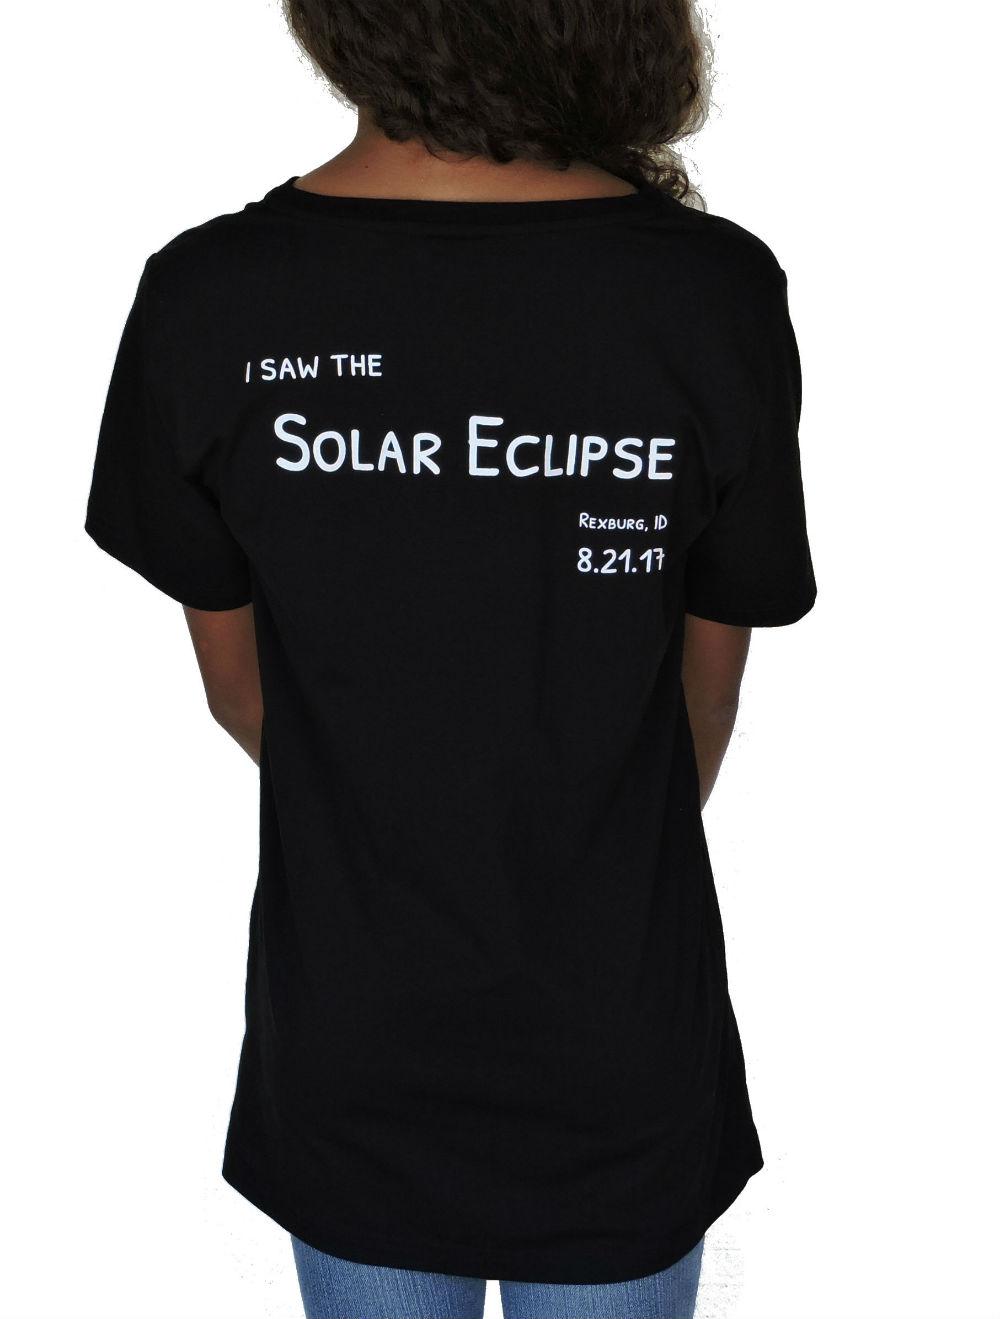 Sephlin - Lady E Girl's Solar Eclipse T-Shirt Black